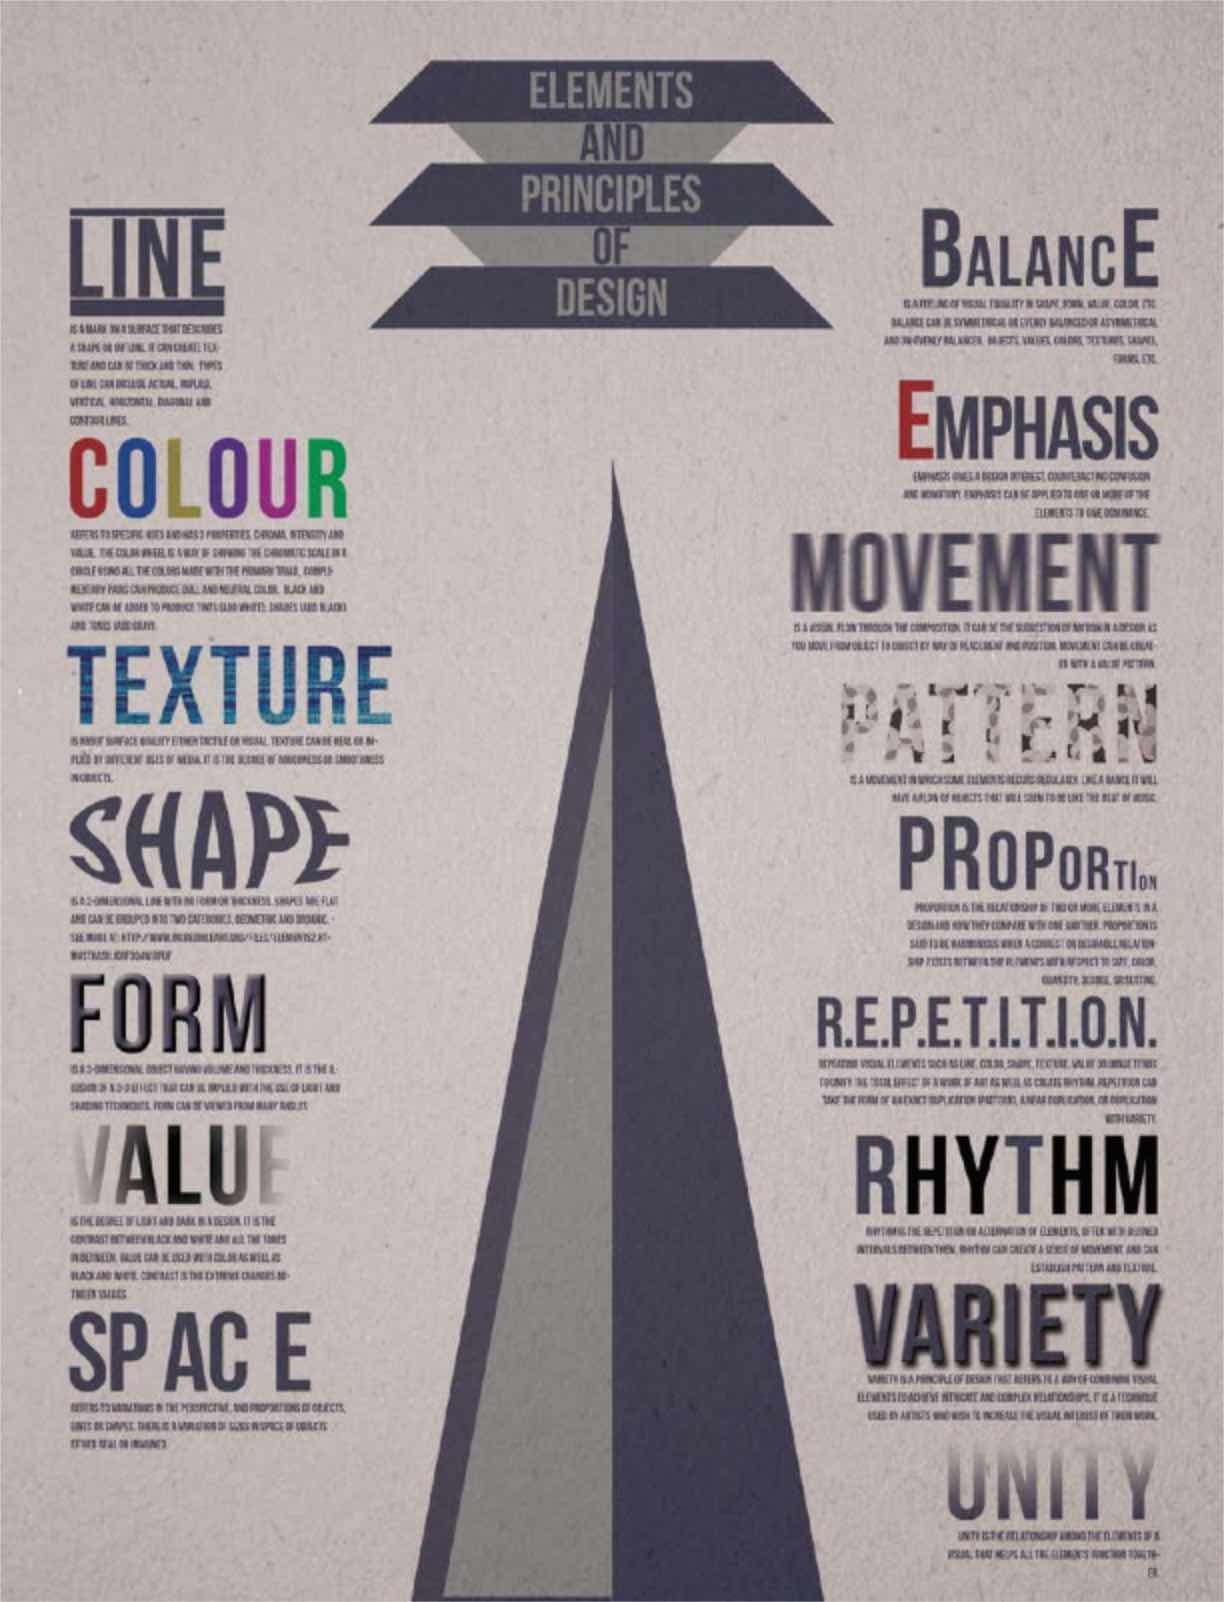 Elements And Principles Poster Elements Principles